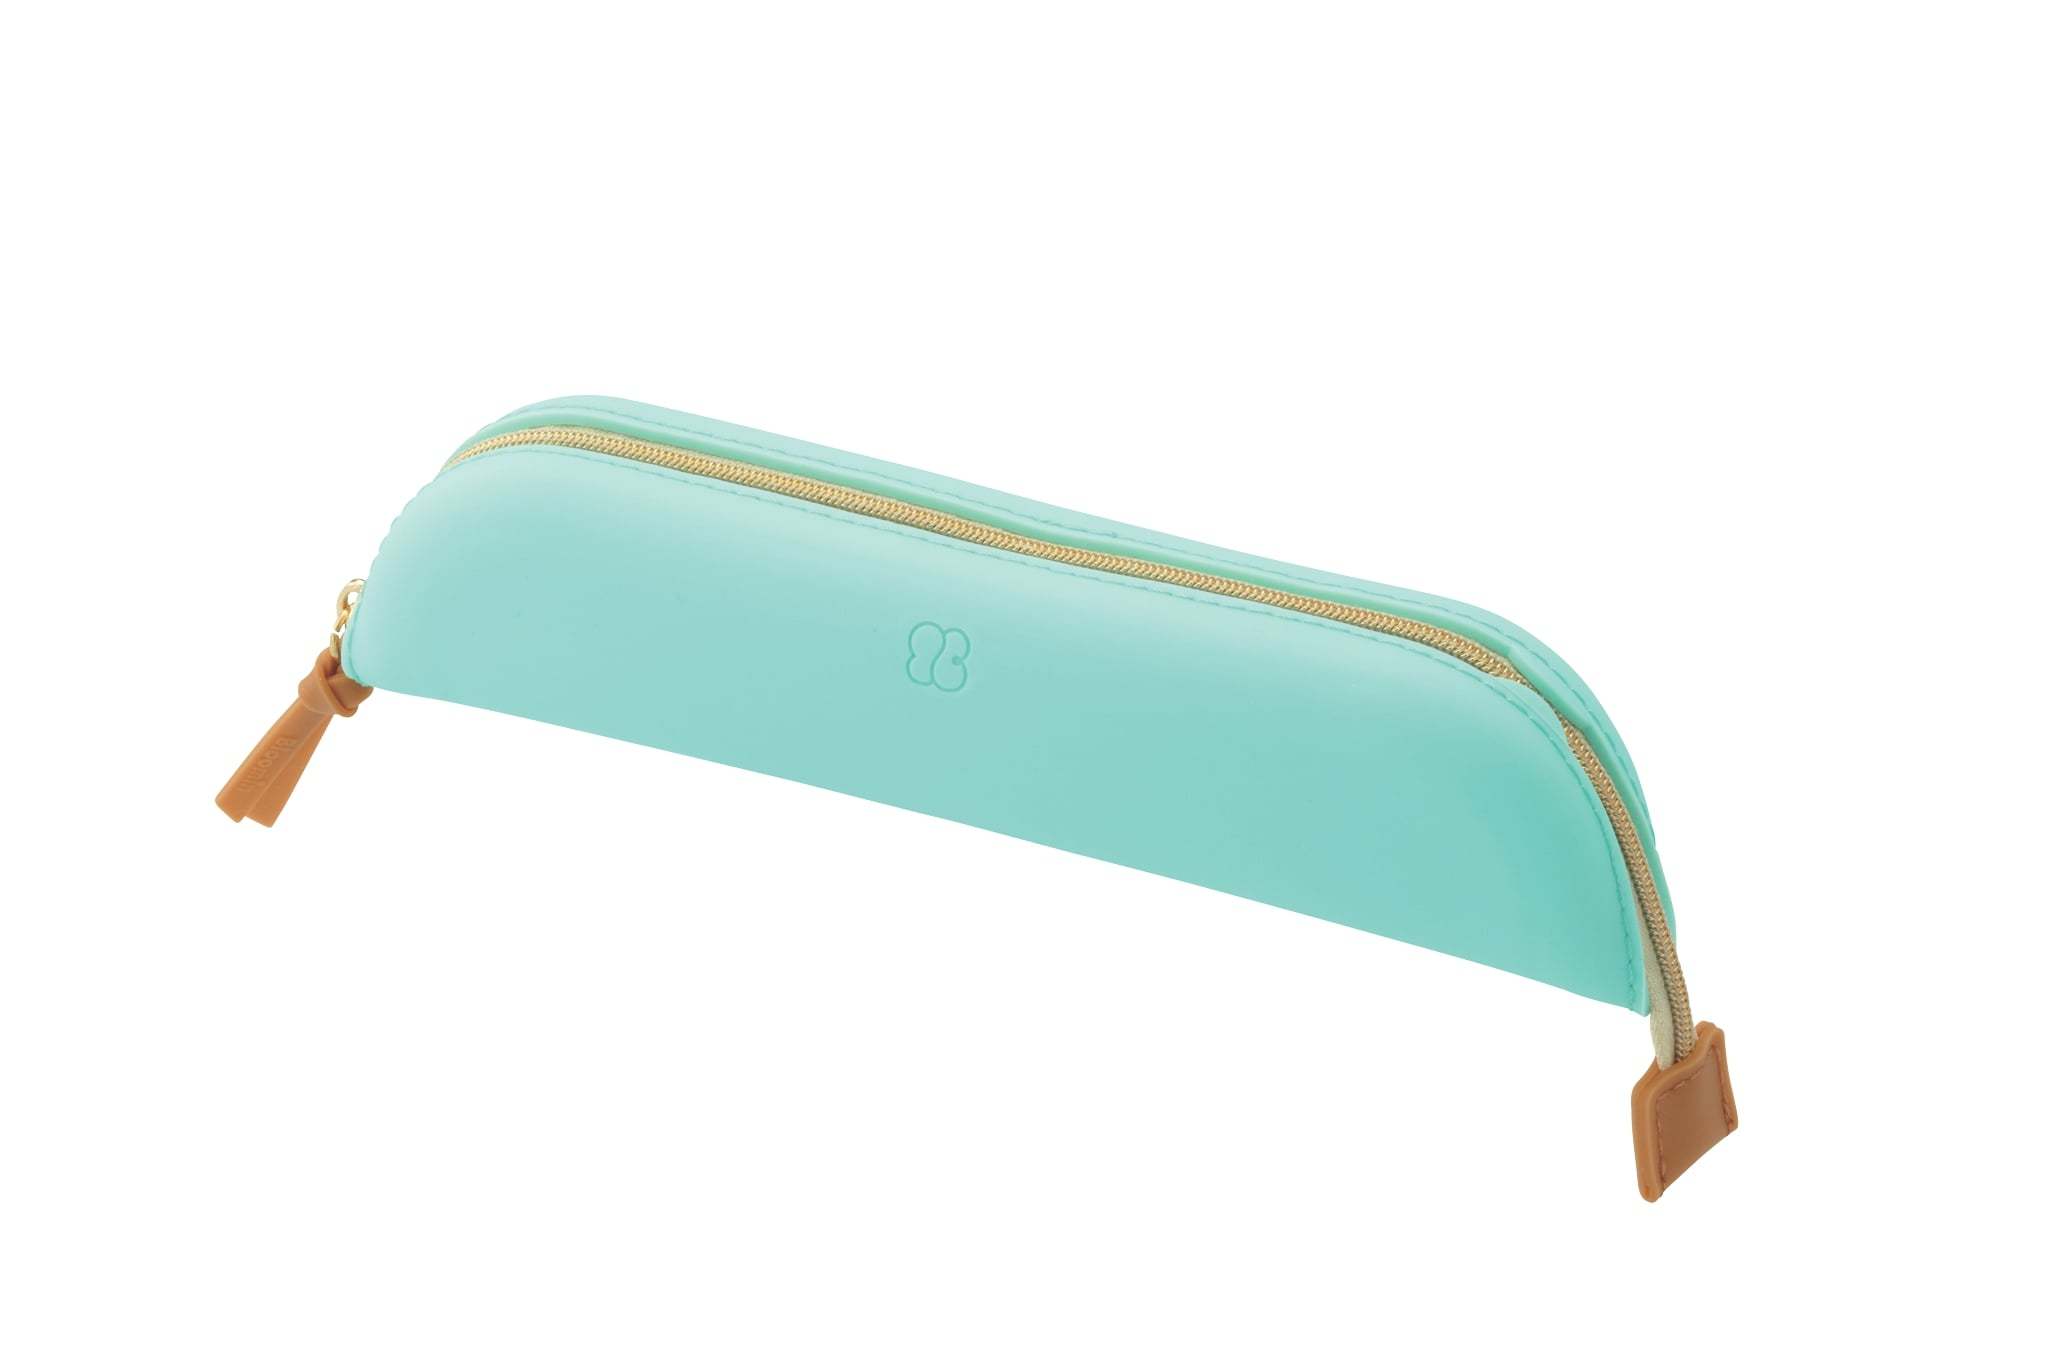 LIHIT Bloomin托盤式筆袋- 綠 A-7730-19